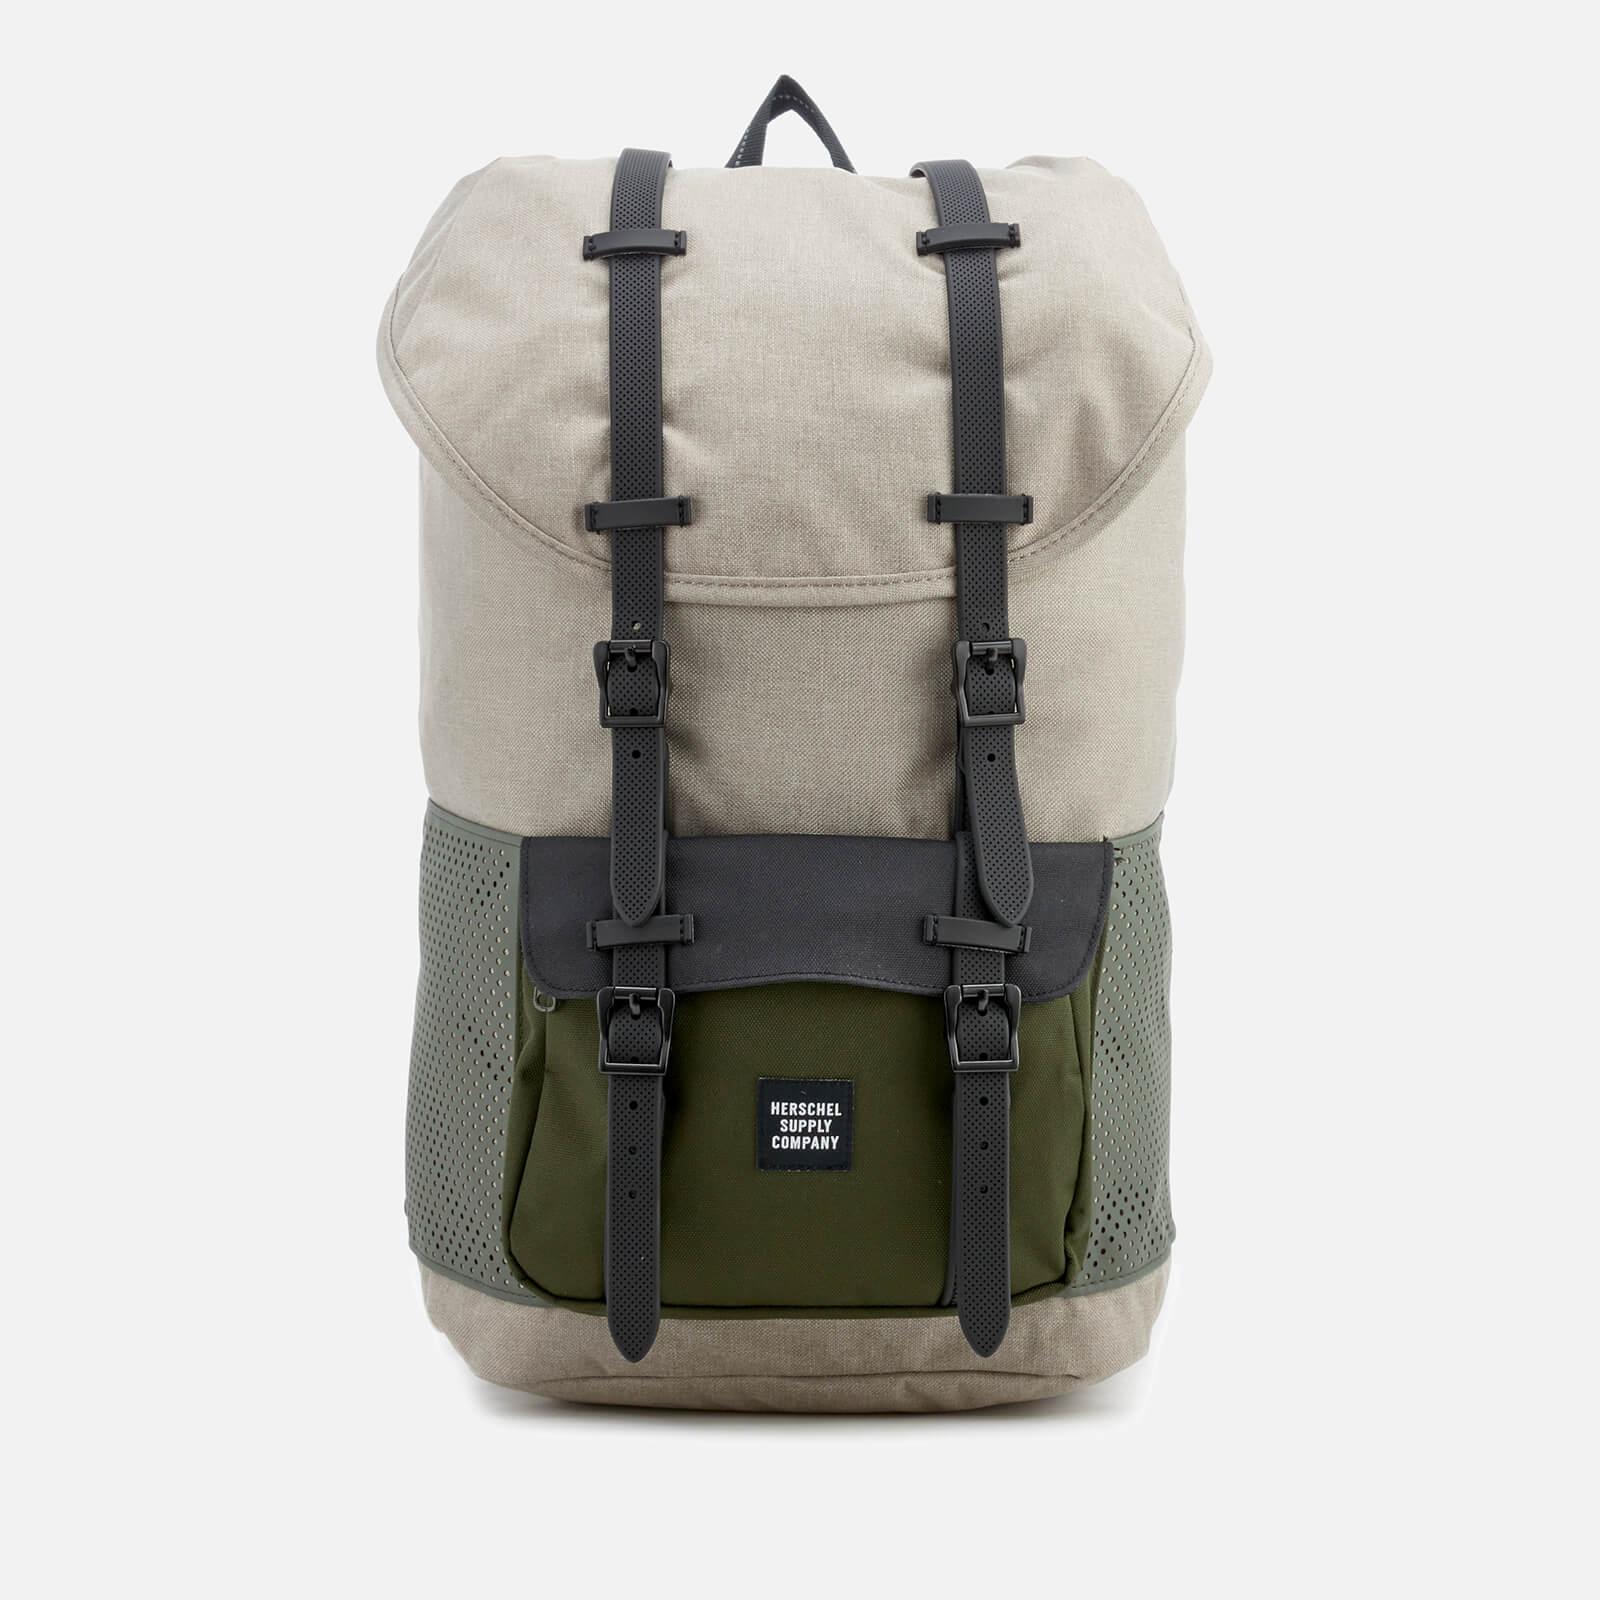 75f0cfbe334 Herschel Supply Co. Men s Little America Backpack - Light Khaki  Crosshatch Forest Night Mens Accessories